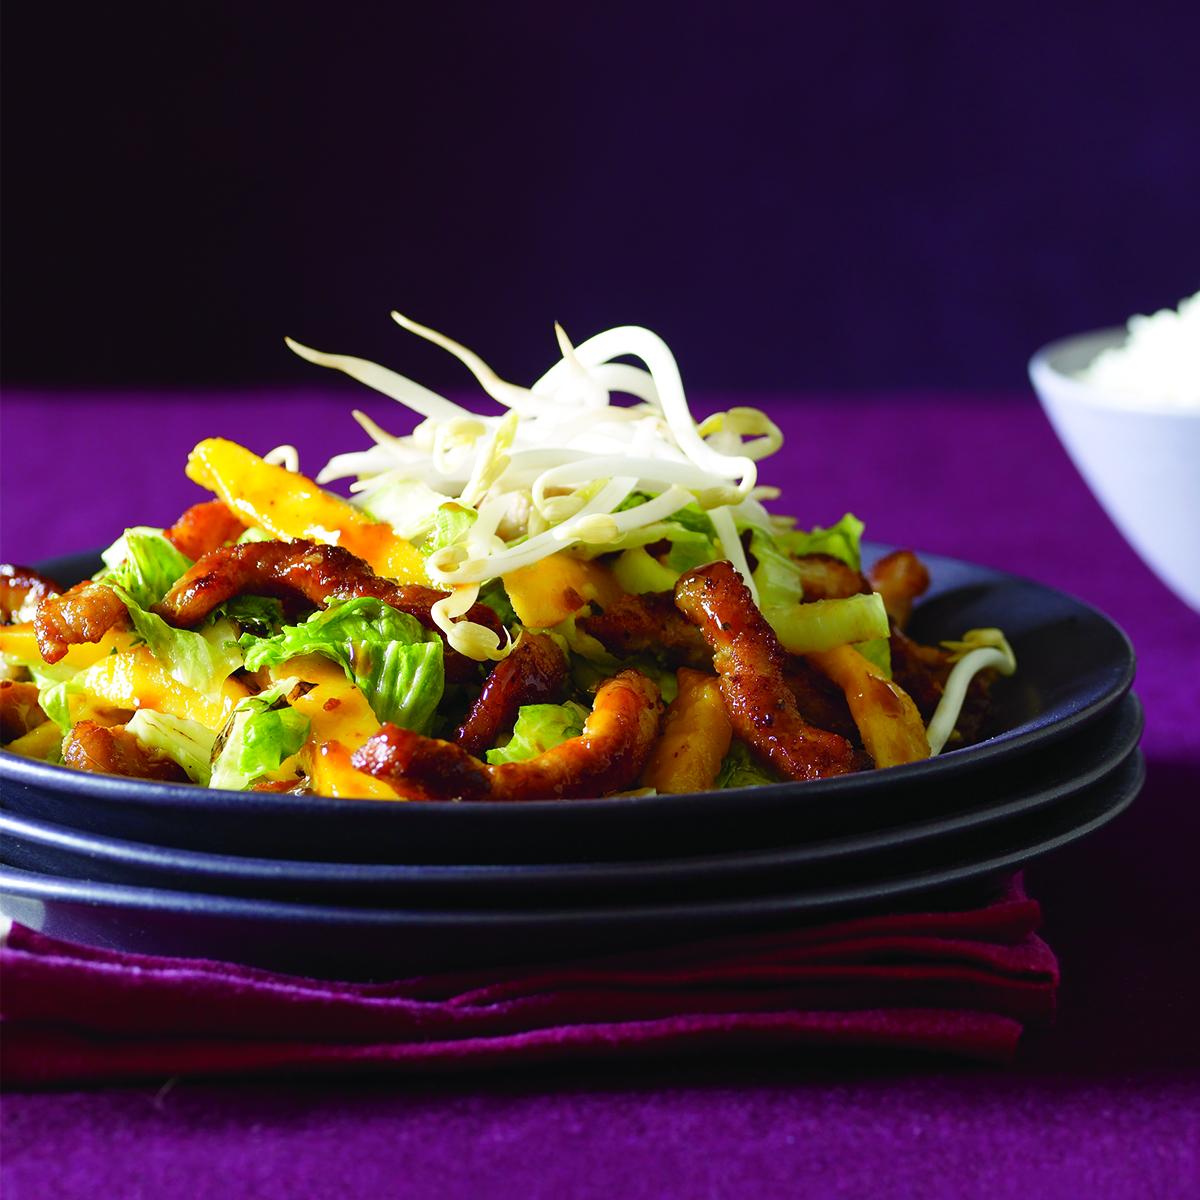 Teriyaki Pork-and-Mango Stir-Fry